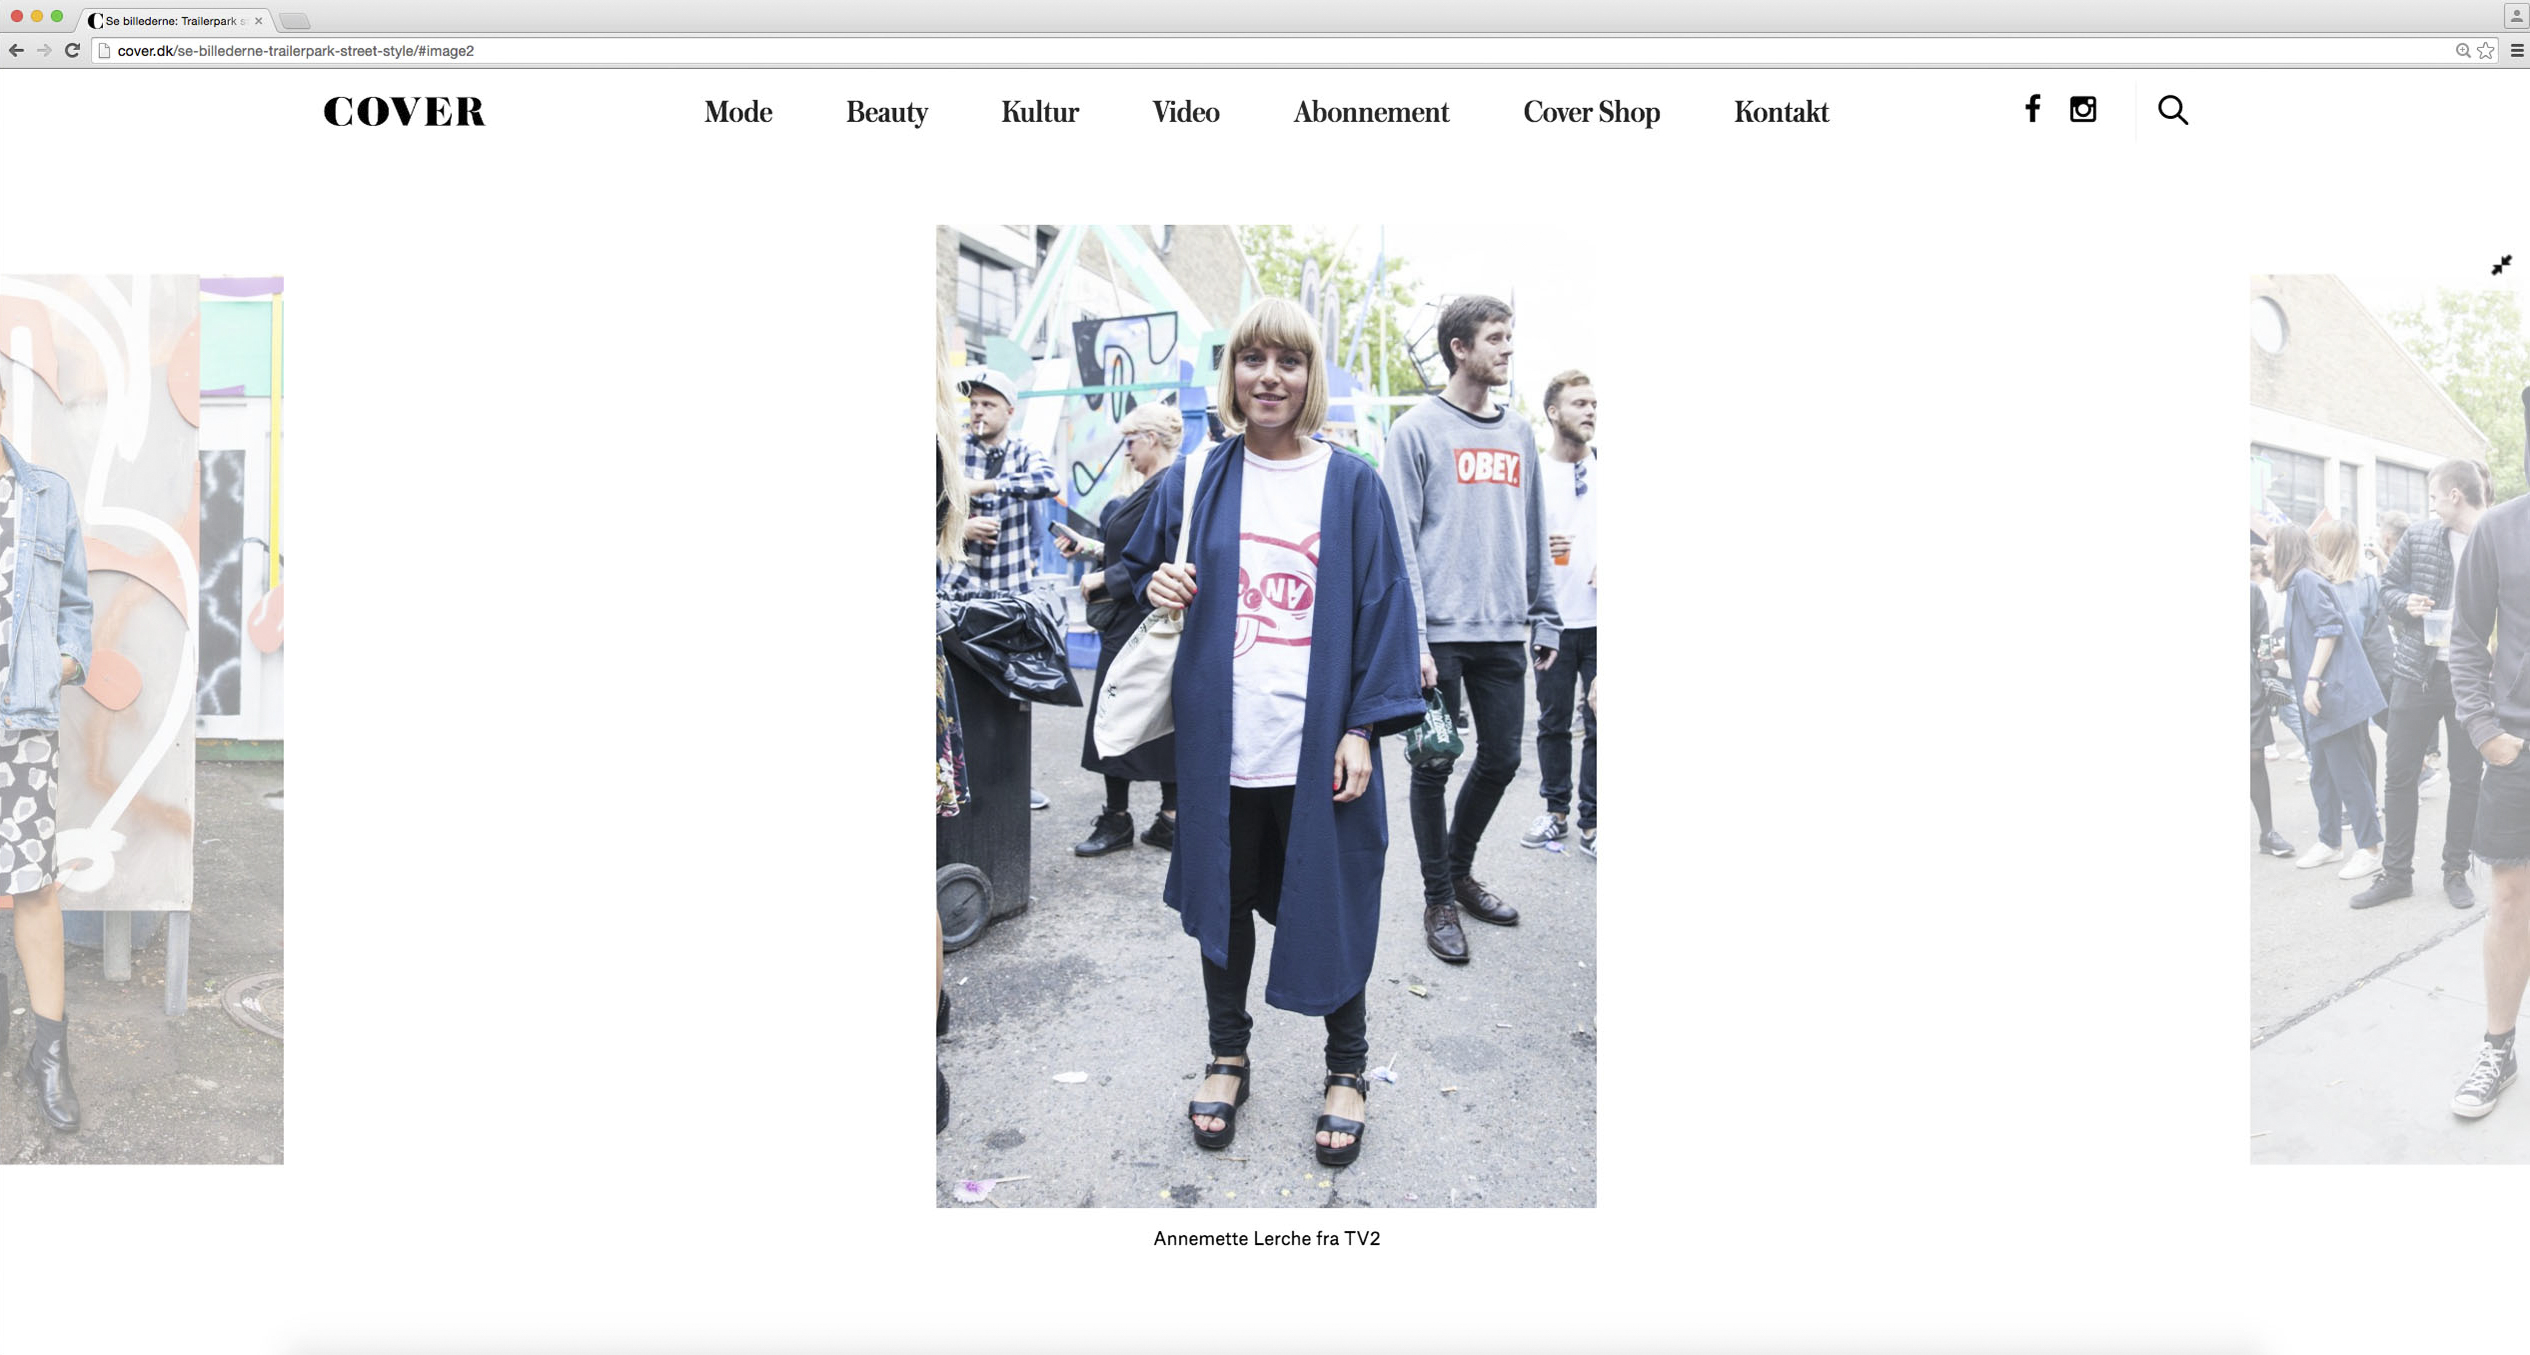 Streetstyle_CoverMagazine_TrailerparkFestival2016_2_1